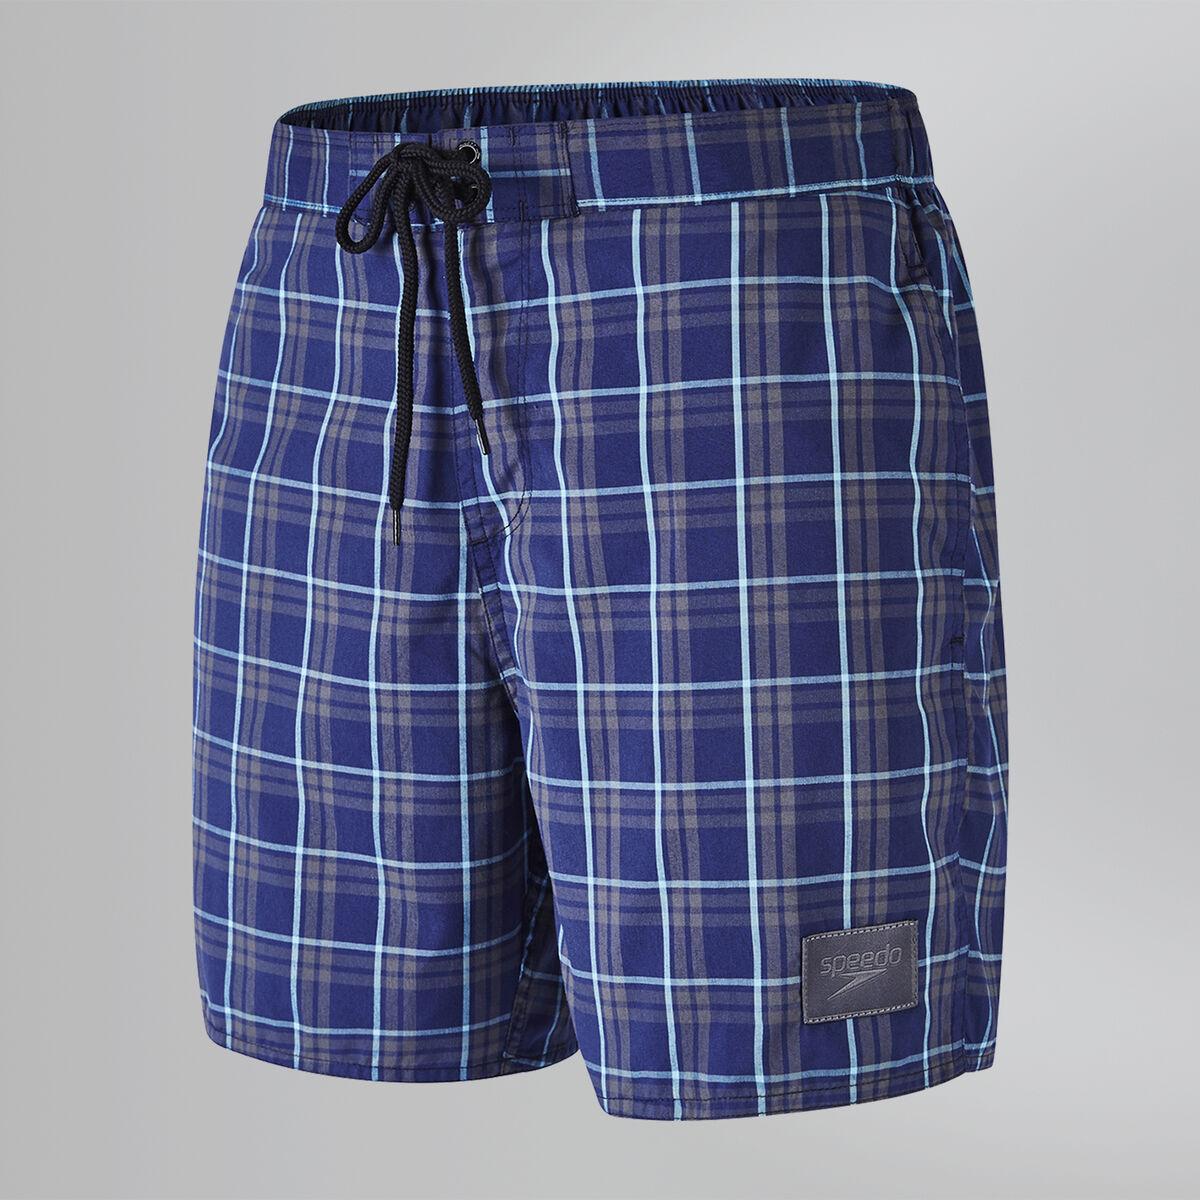 "Check Leisure 16"" Swim Shorts"